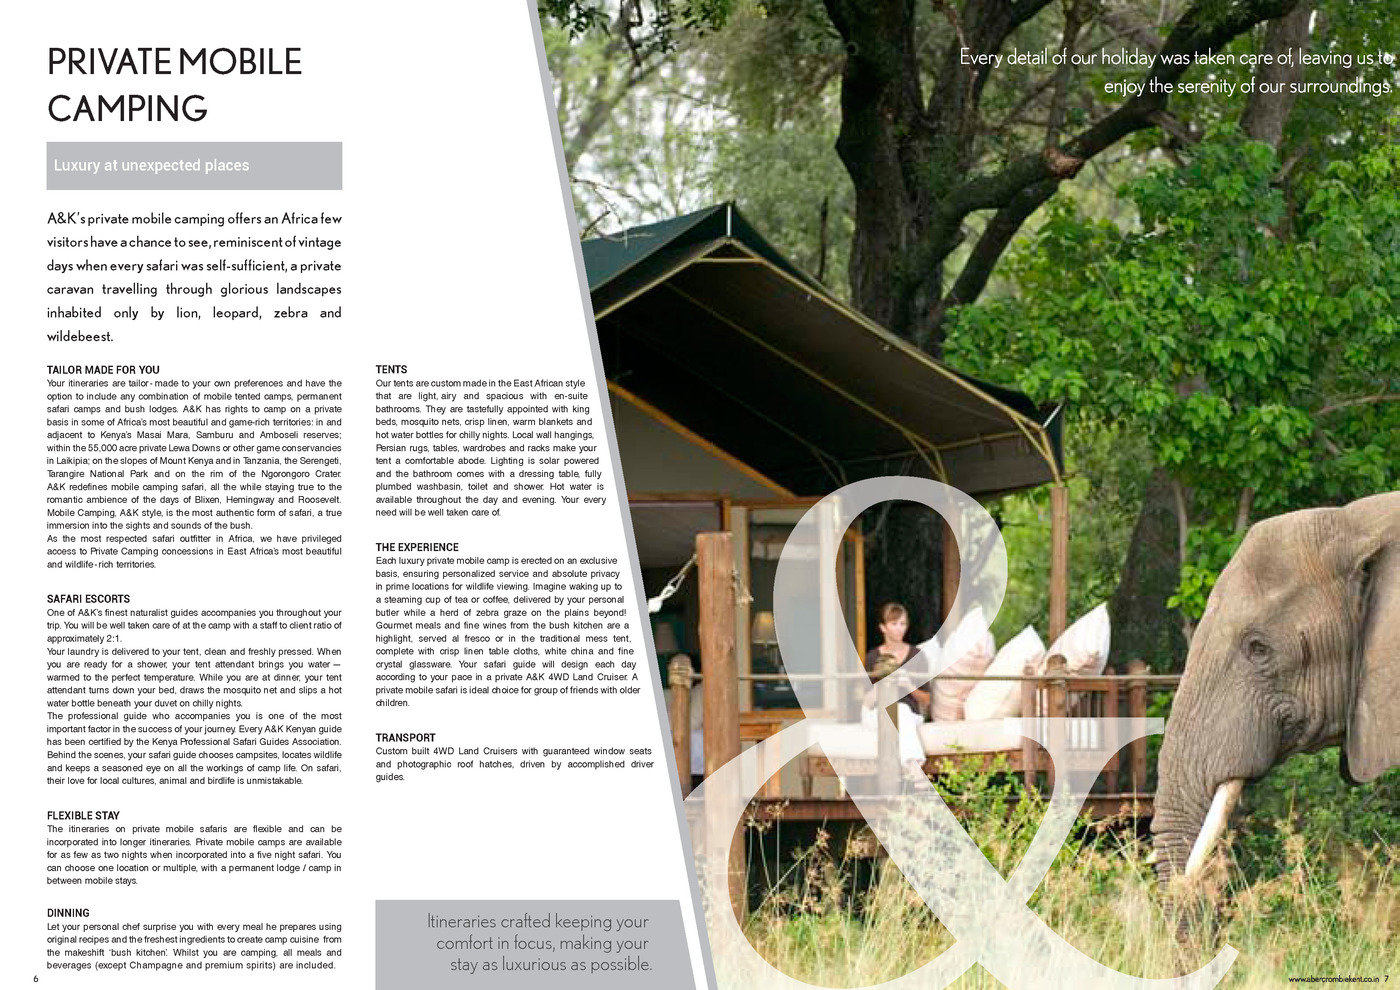 Abercrombie & Kent - Brochure Design by Sandeep Shukla at